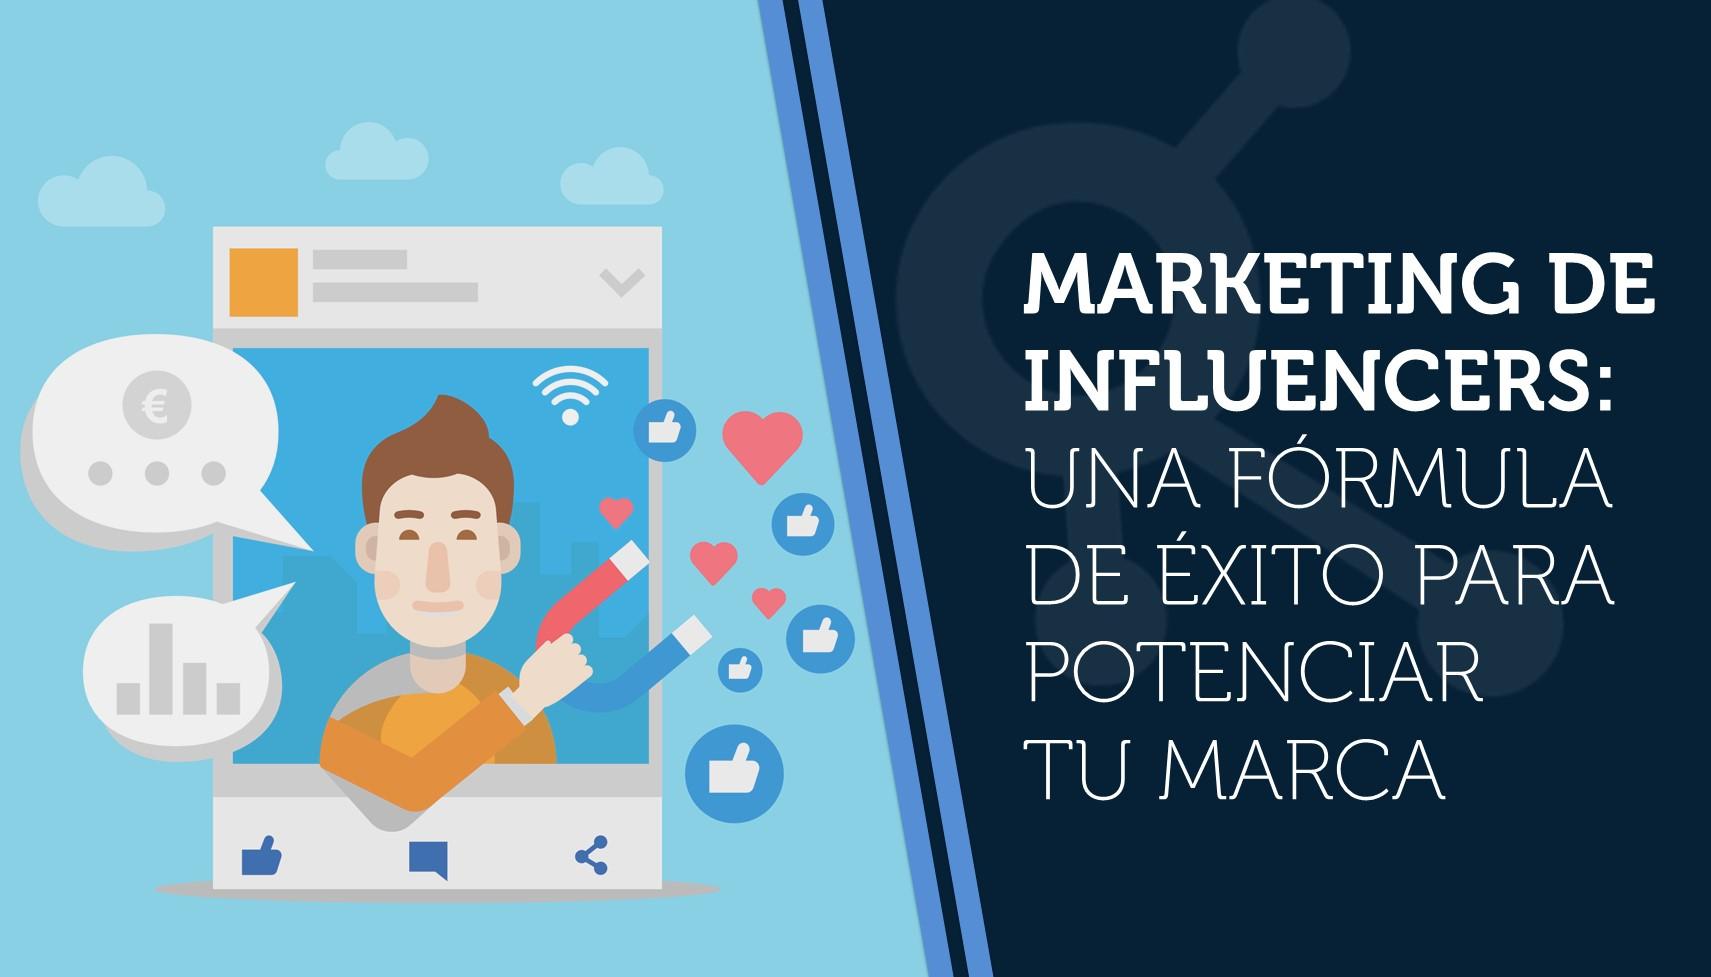 Marketing de influencers: una fórmula de éxito para potenciar tu marca